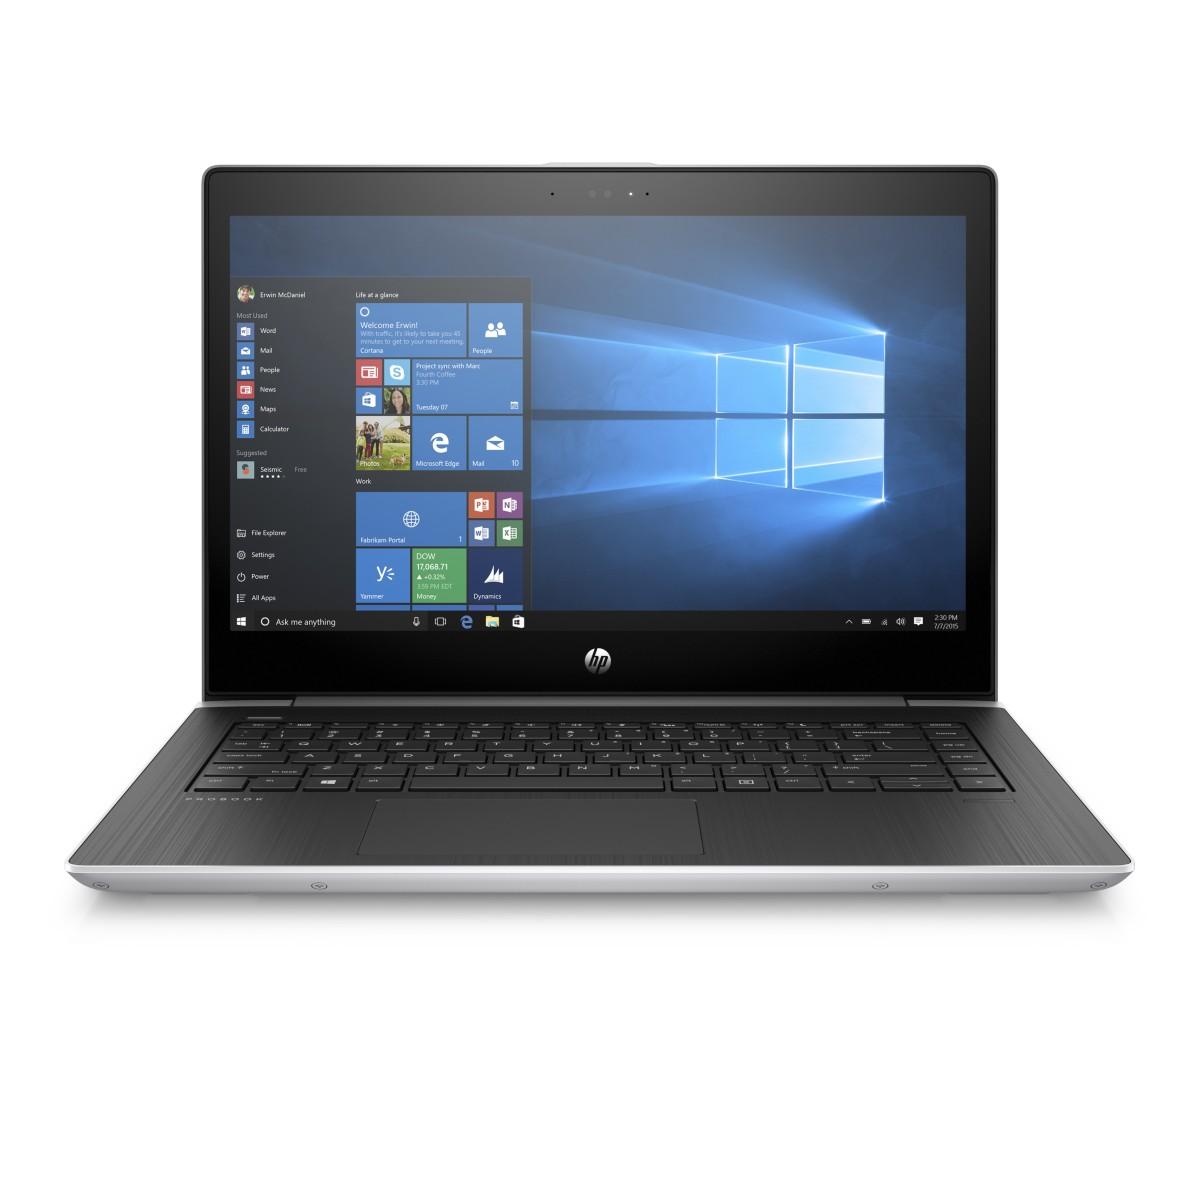 "HP ProBook 470 G5, i5-8250U, 17.3 FHD, GF930MX/2G, 16GB, 256GB+volny slot 2,5"", FpR, ac, BT, Backlit kbd, W10Pro"